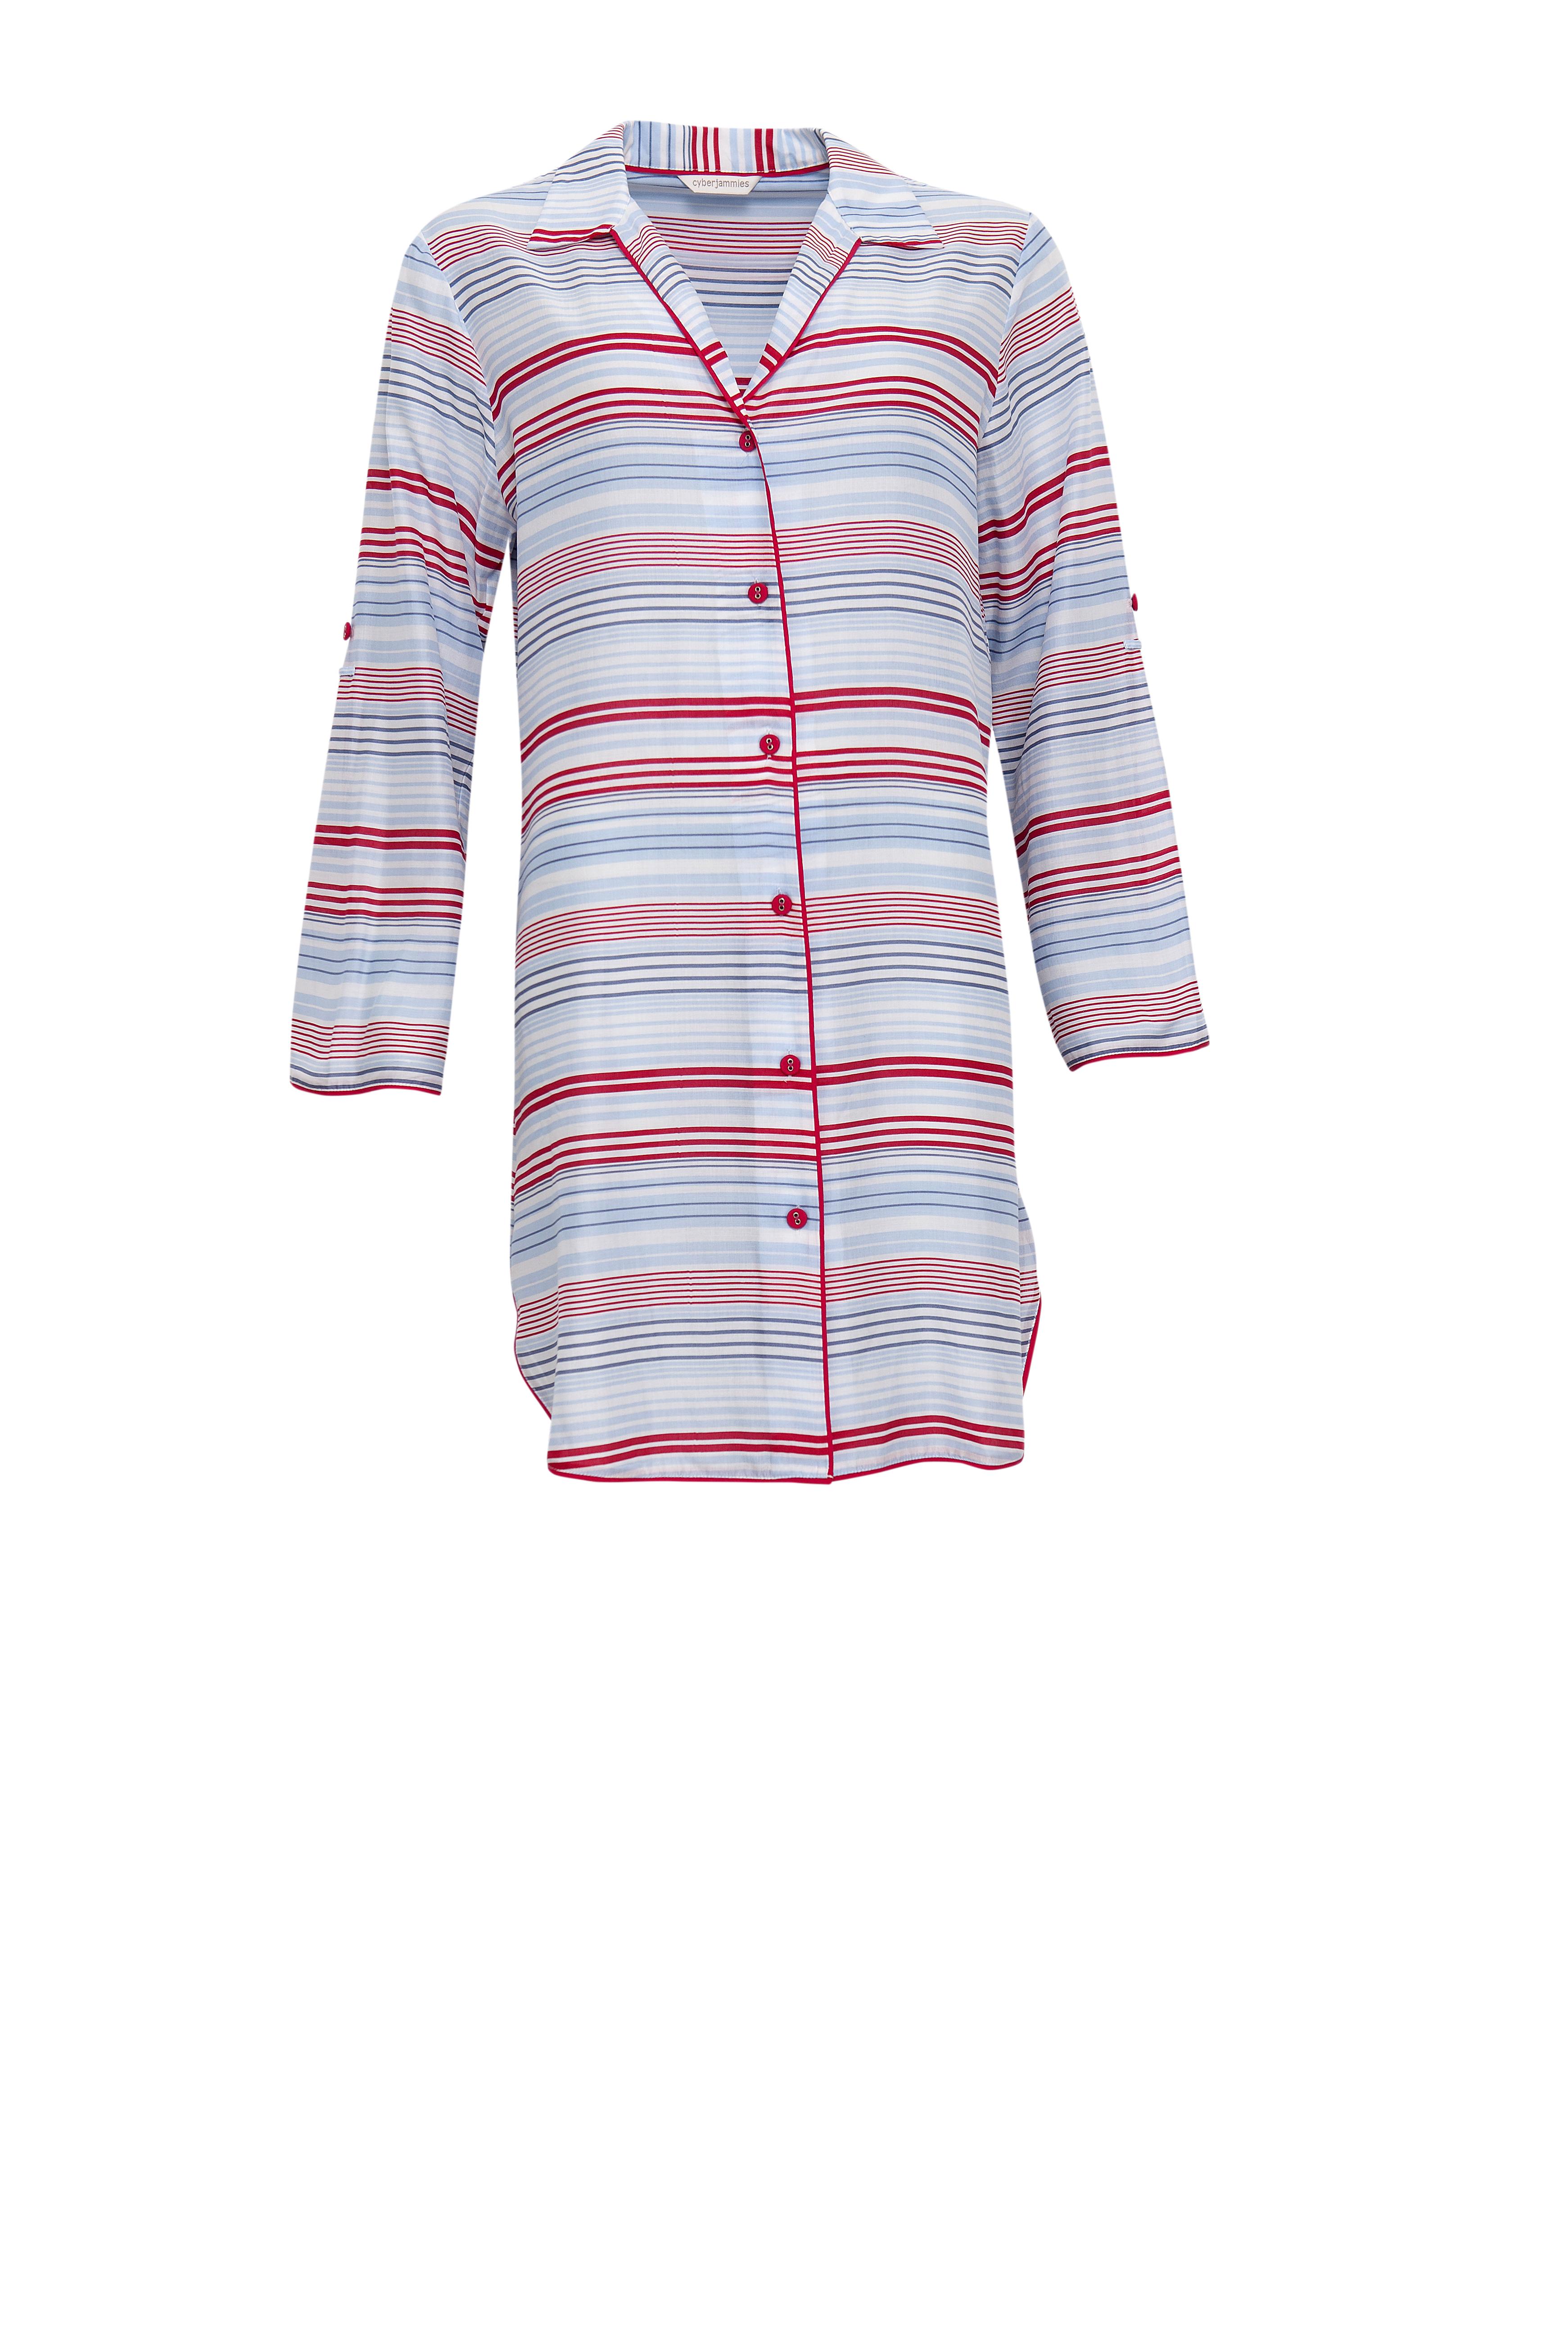 Heidi Woven Nightshirt - The Pyjama Store a9aea3e0c